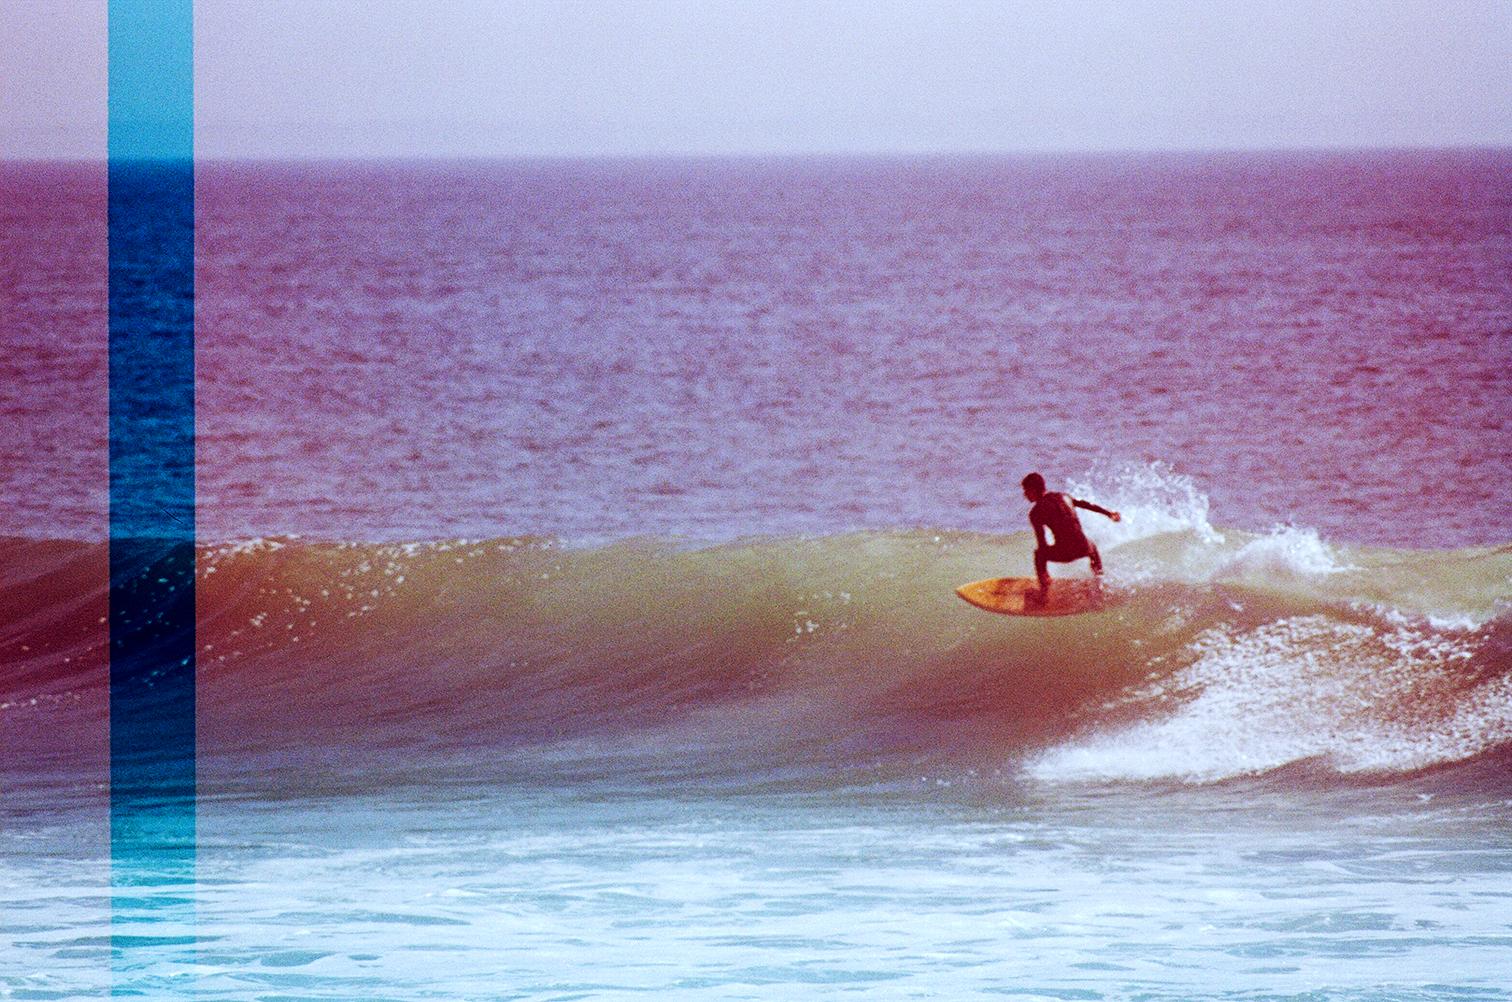 Flying fish surf_0003.jpg